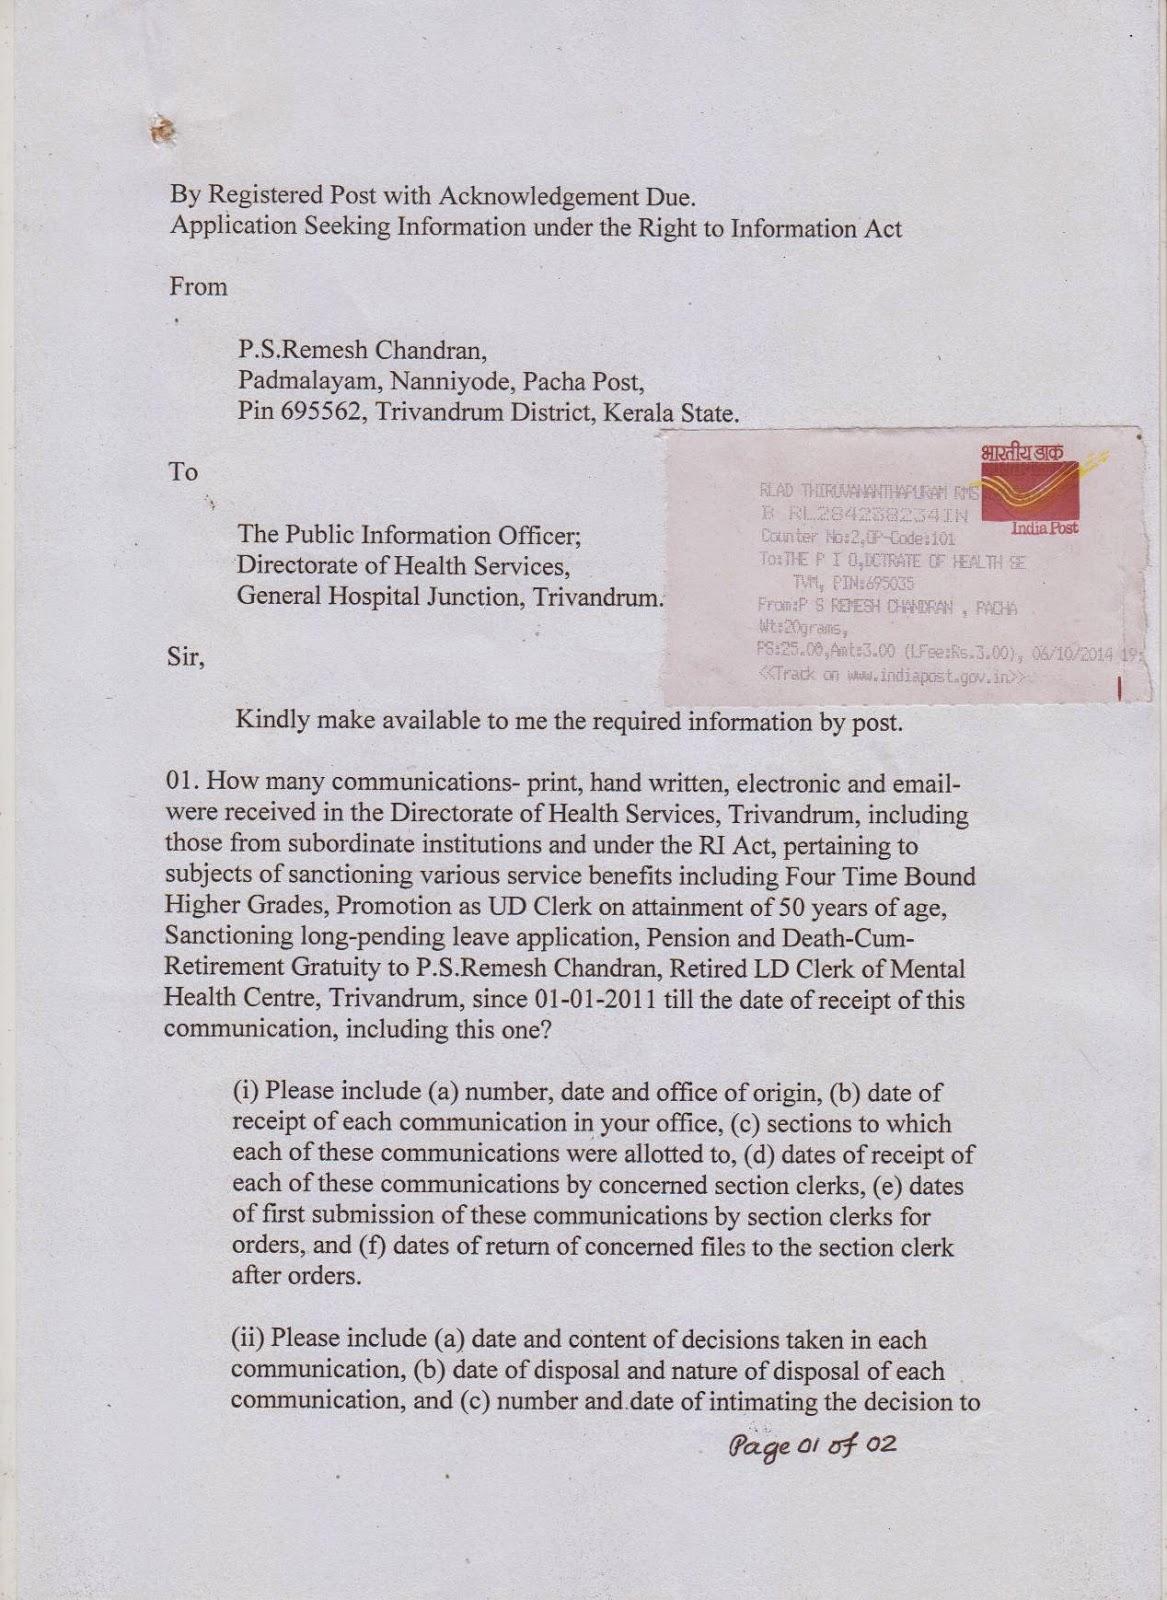 UPSC Civil Services Main Examination Syllabus for IAS